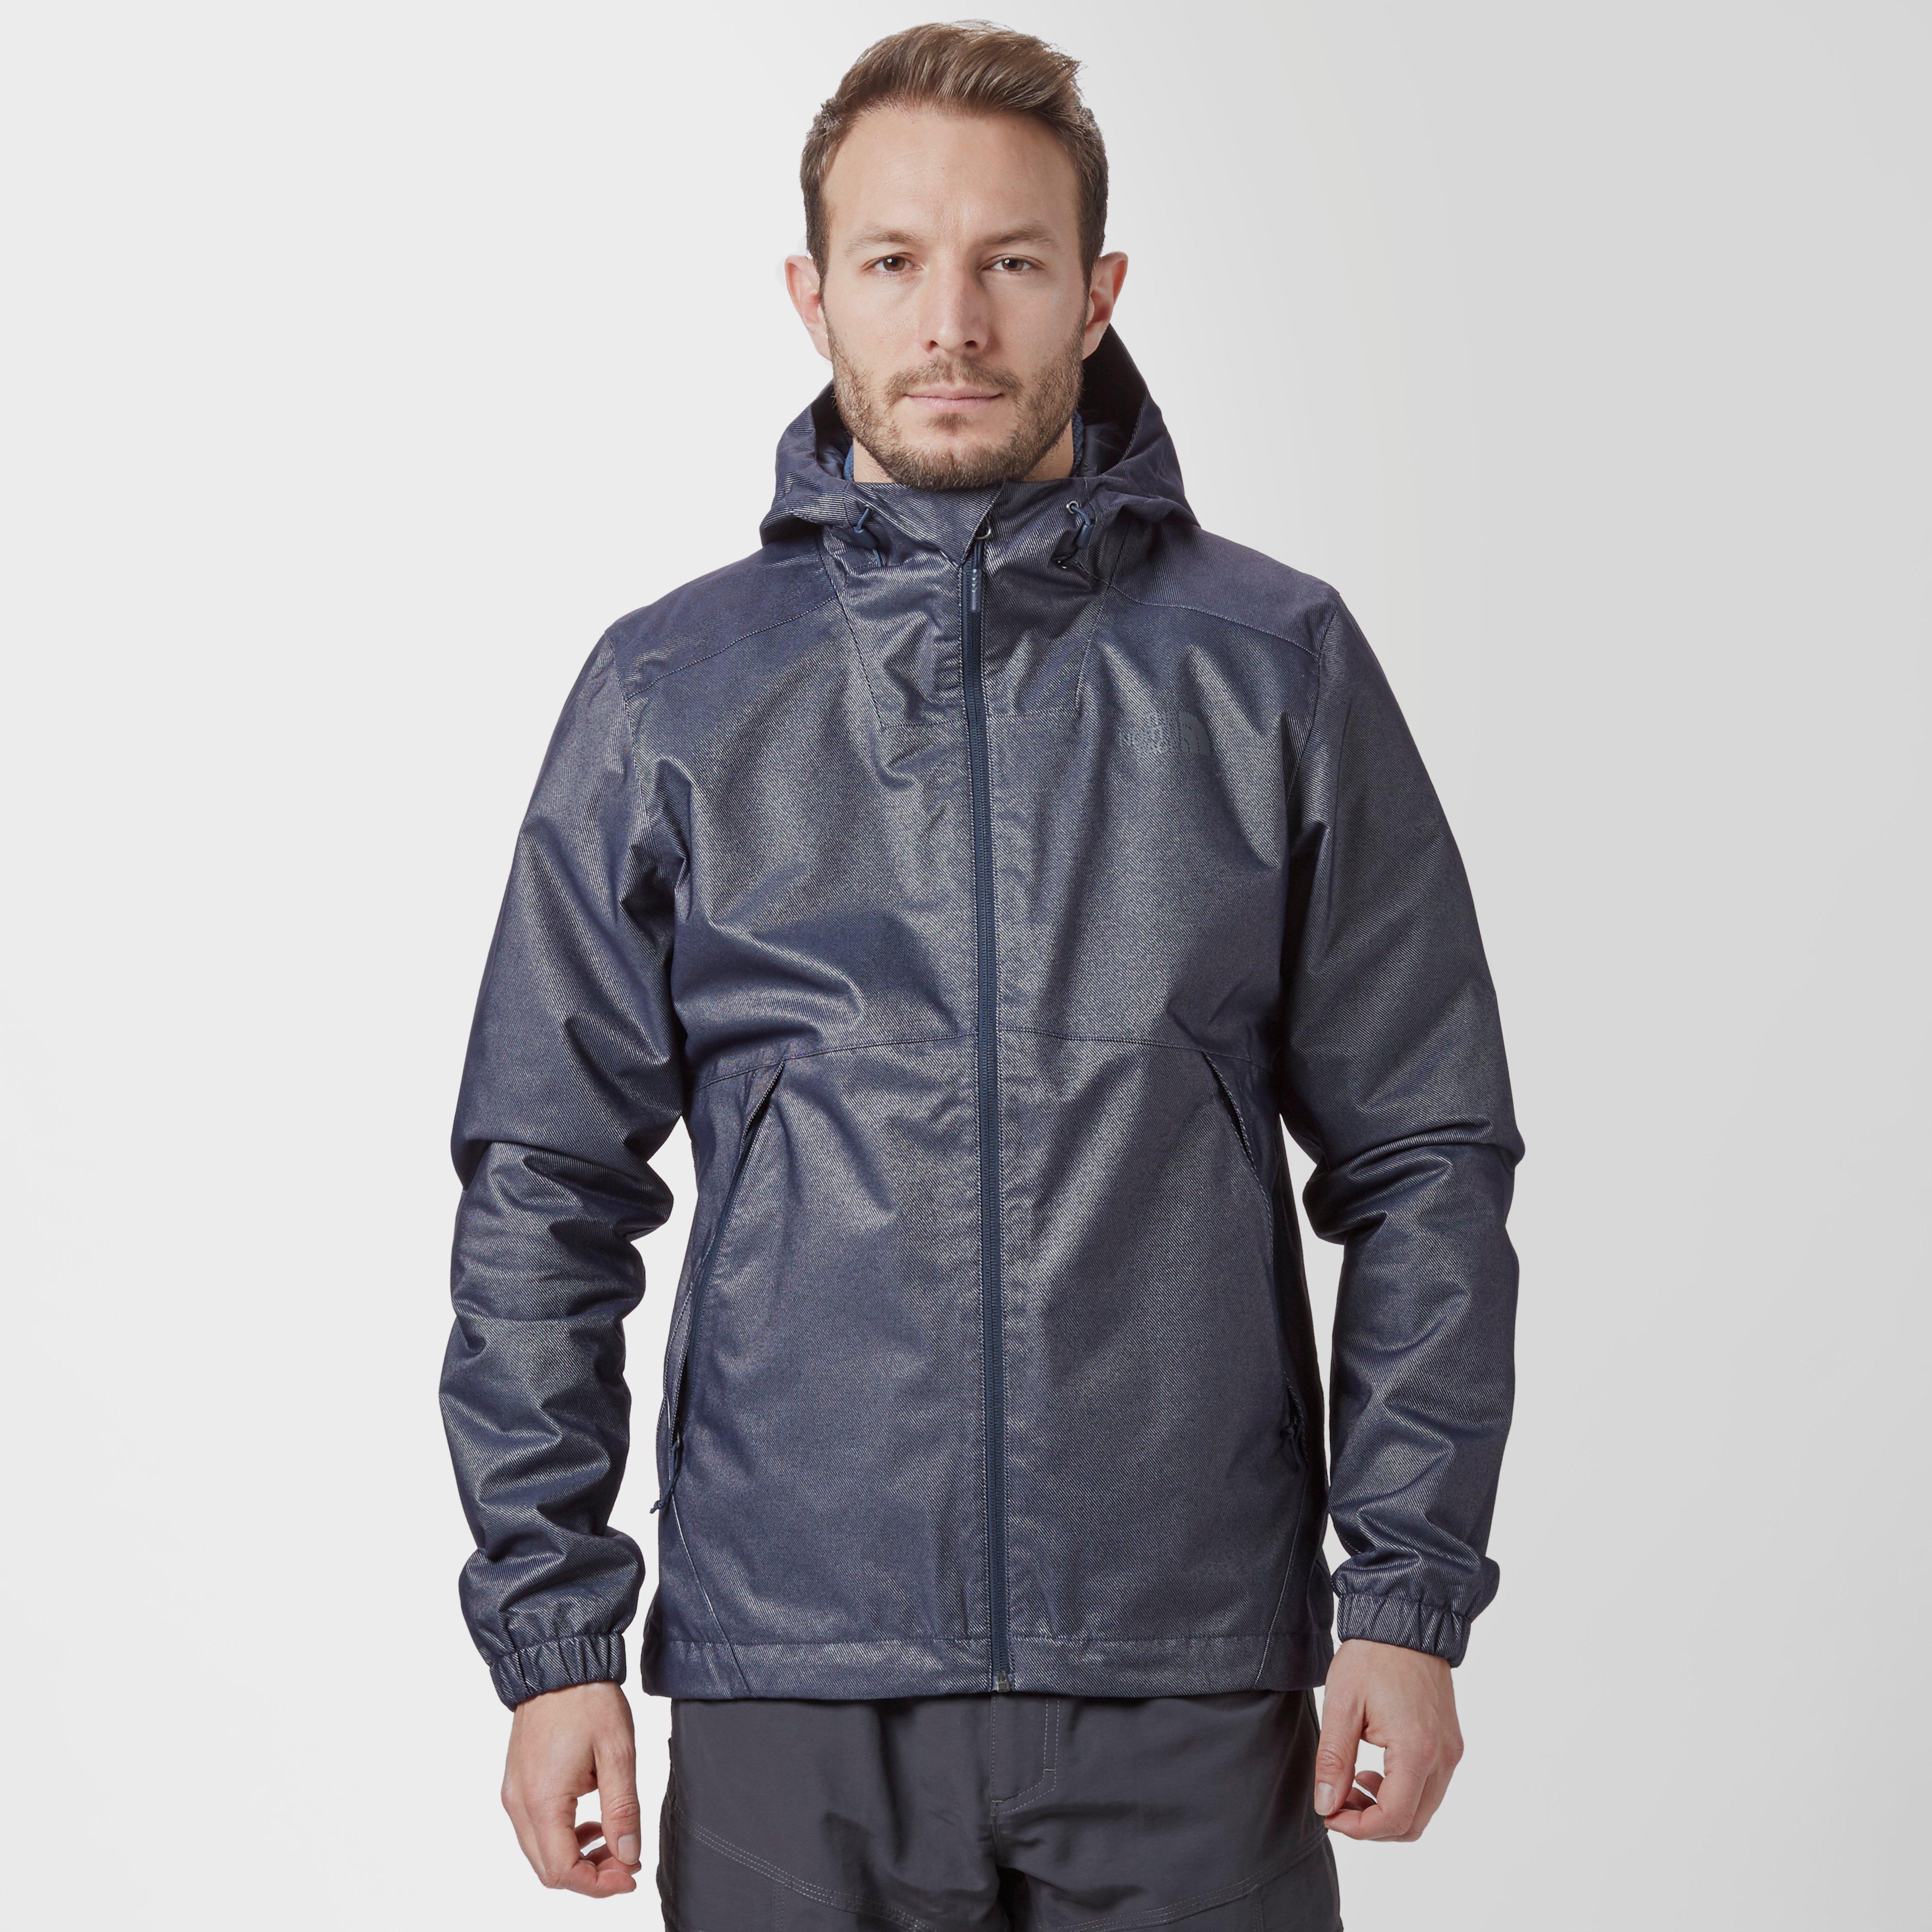 Buy cheap north face jackets